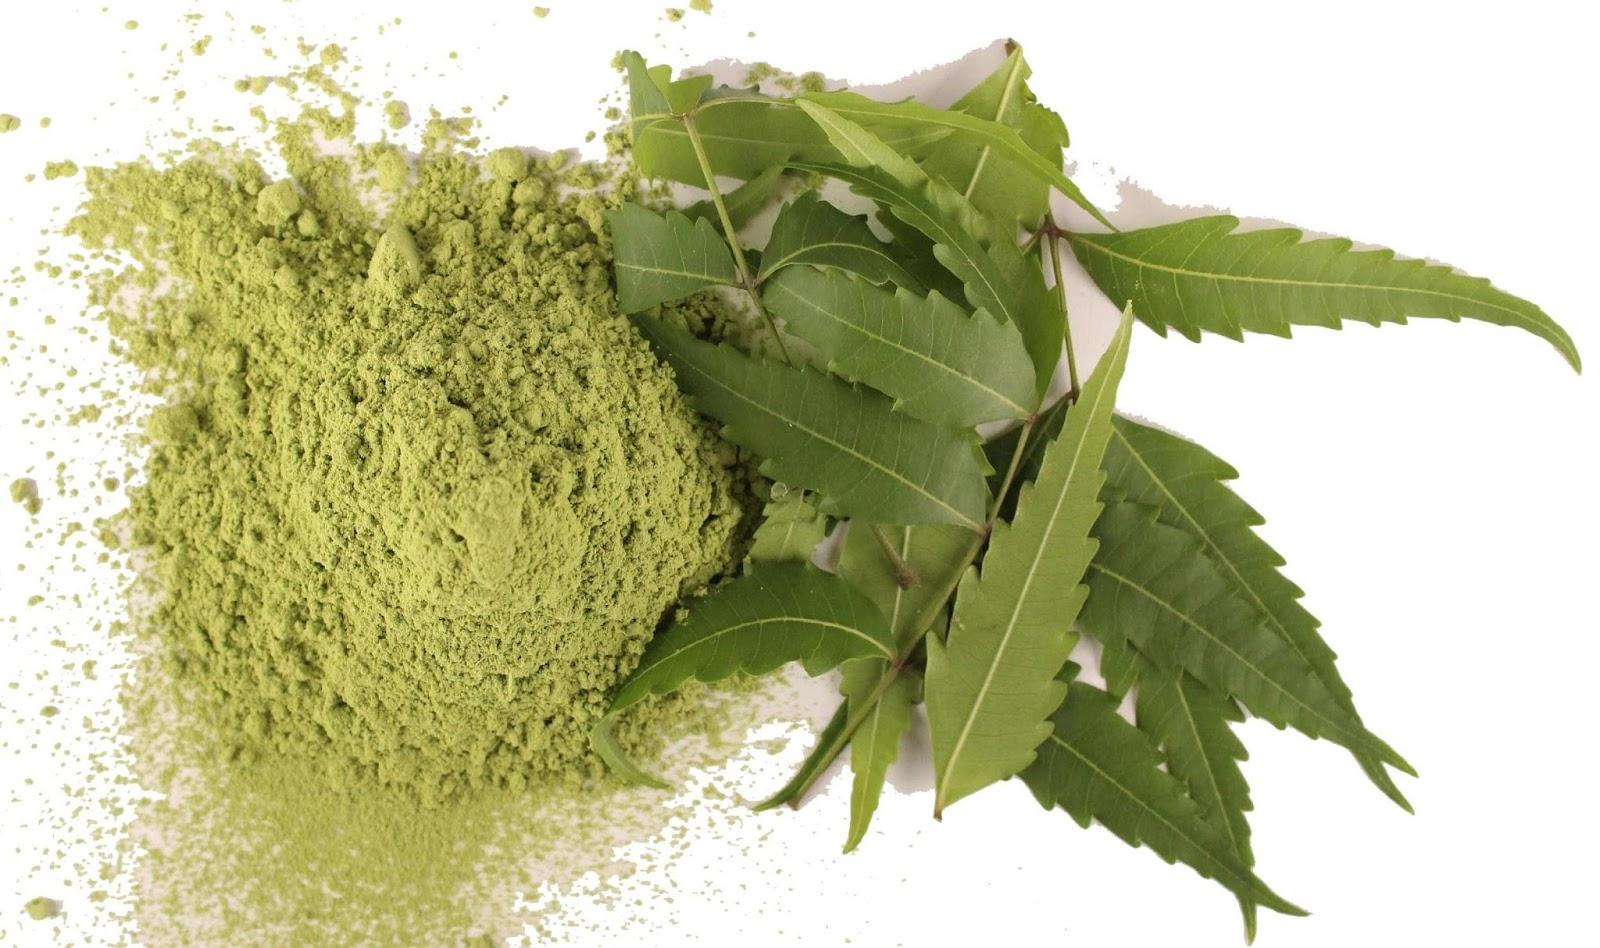 Ayurveda Herbs - Neem Leaves for Beautiful and Glowing Skin